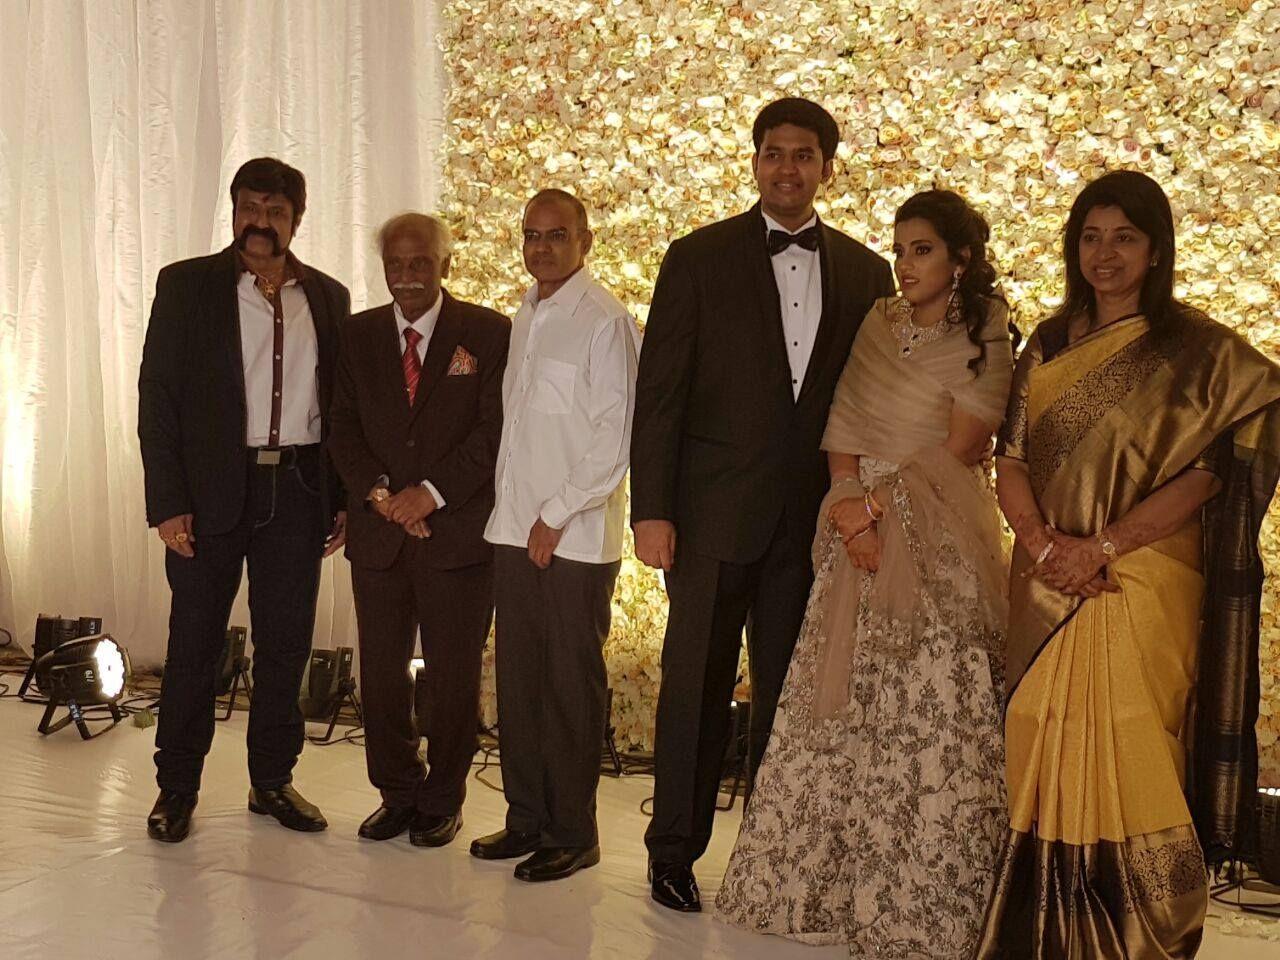 Blessed the couple Sri Deven (Grandson of Late Shri Nandamuri Taraka Rama Rao garu) and Amruthavalli, along with Shri Nara Chandrababu Naidu, Chief Minister of Andhra Pradesh and Shri Naini Narshimha Reddy, Home Minister of Telangana.